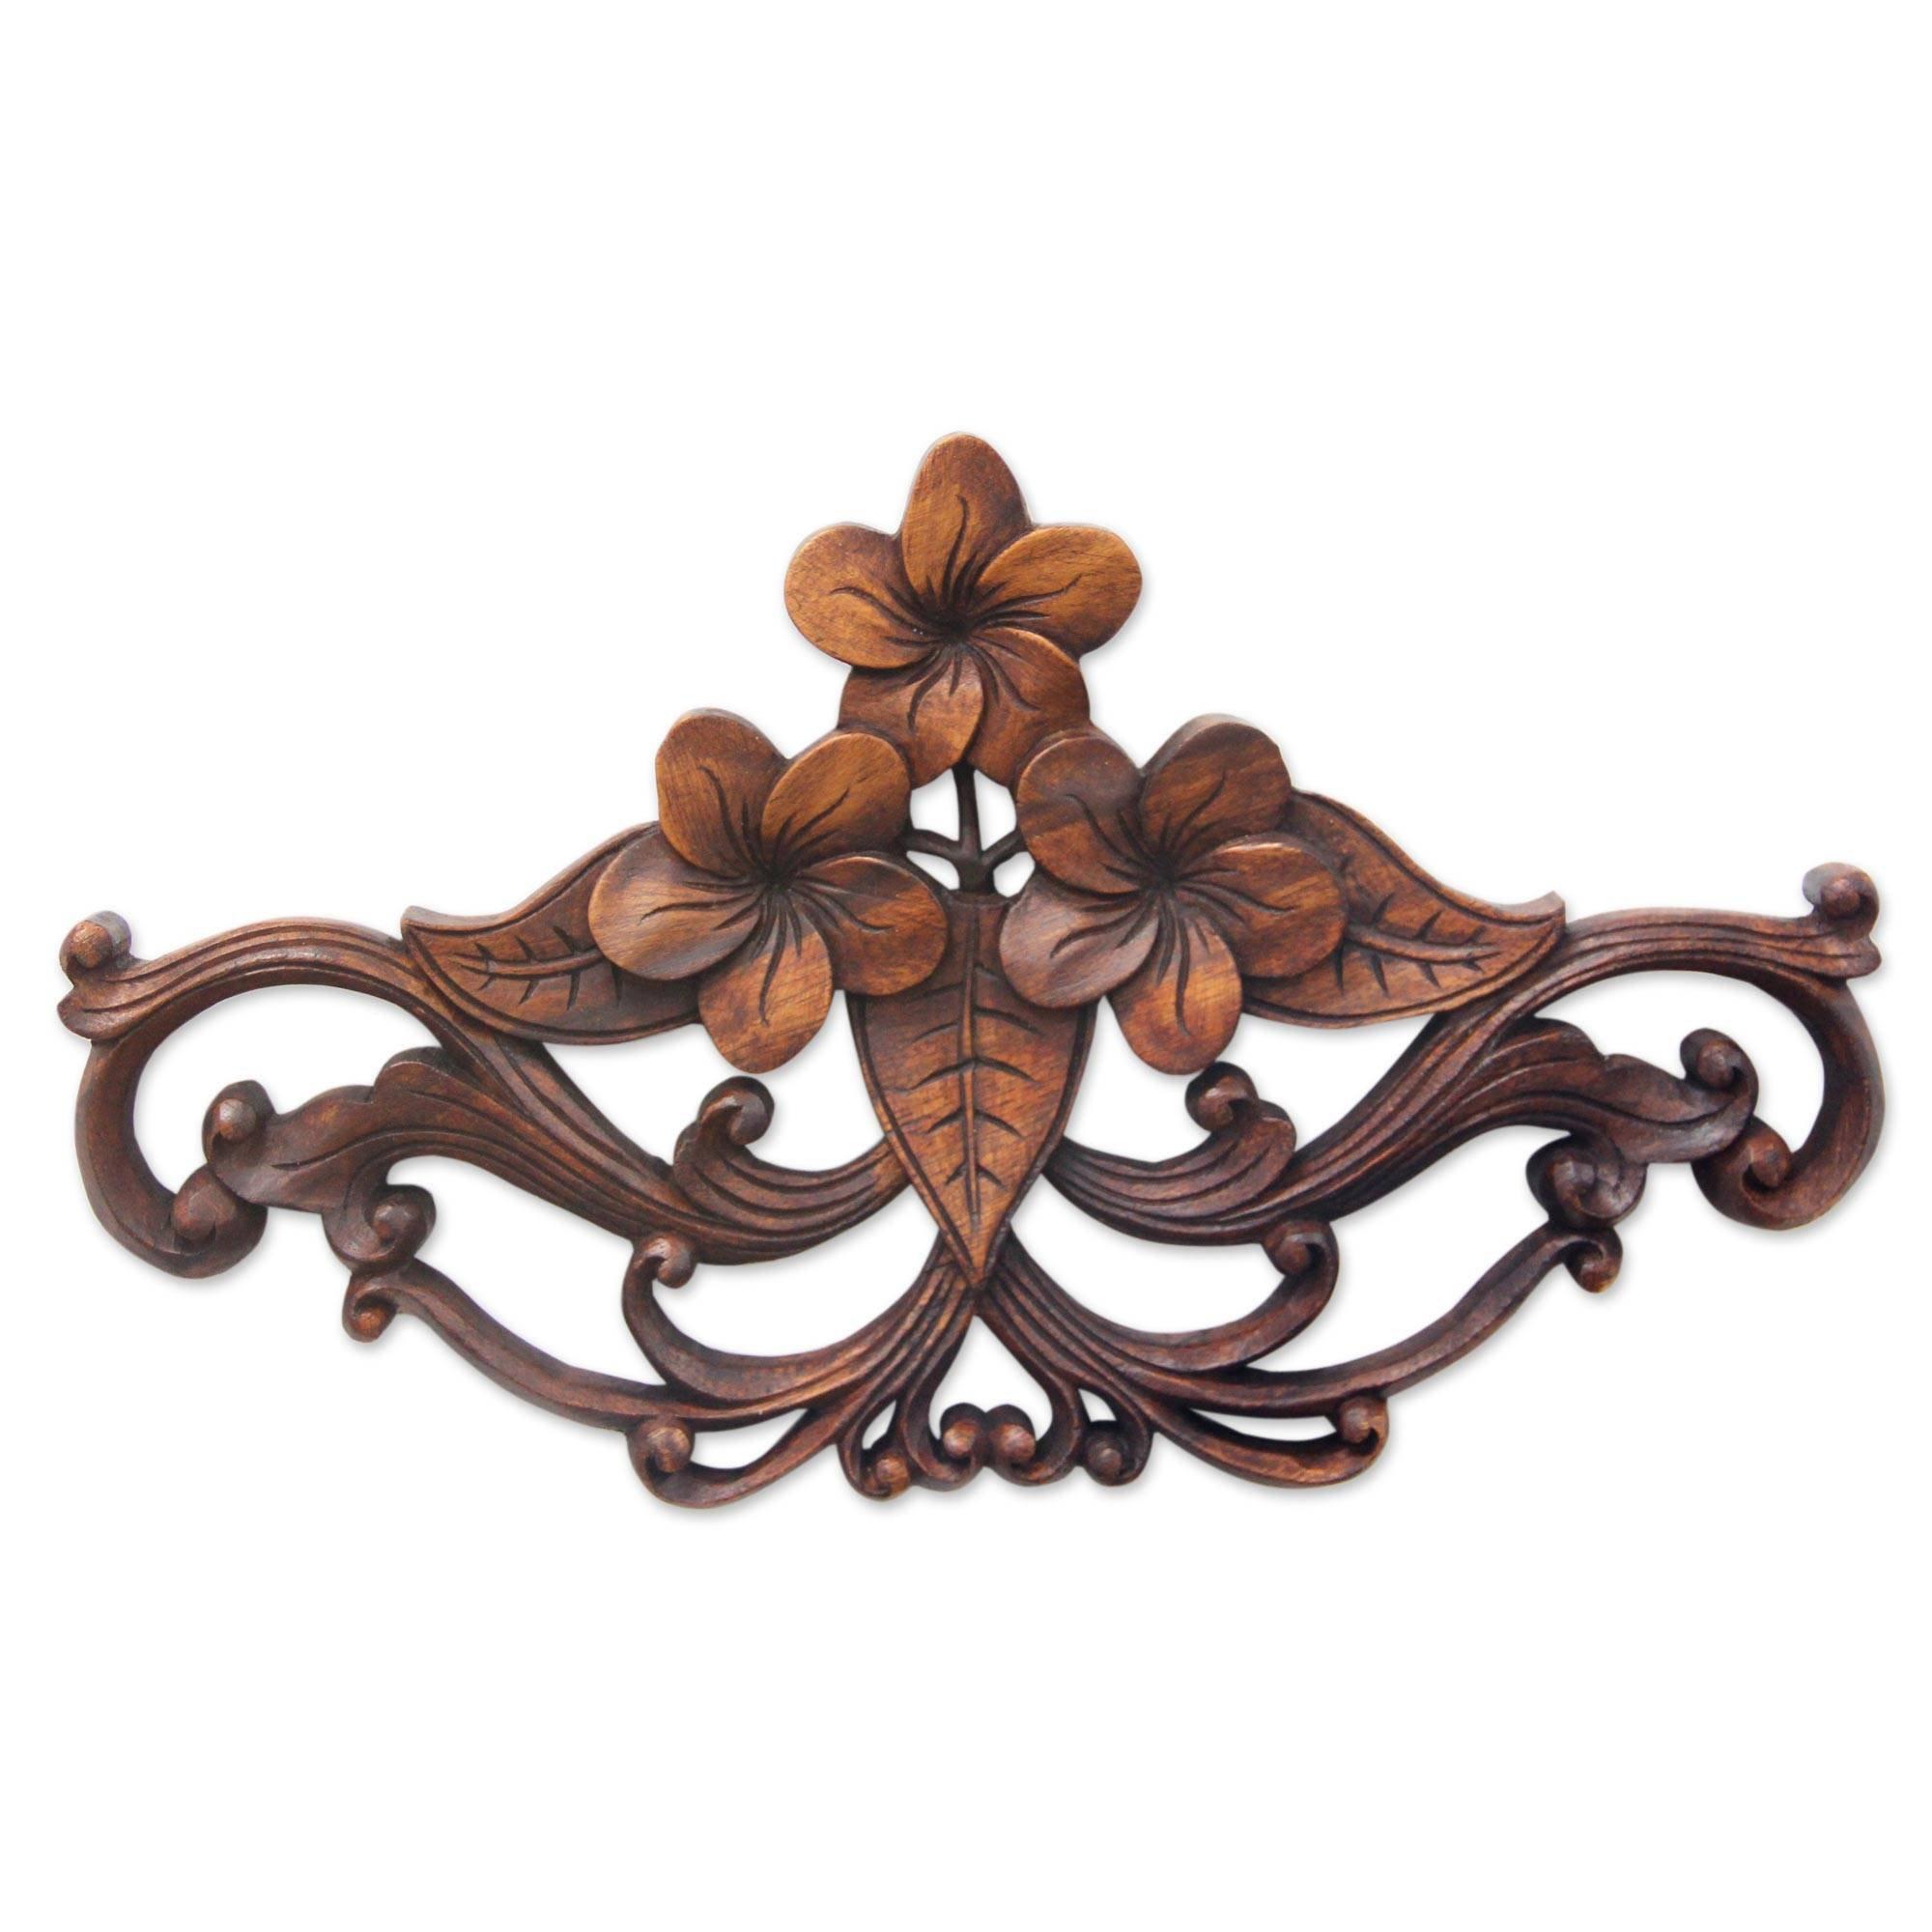 NOVICA Floral Suar Wood Wall Sculpture, Brown, Frangipani Garland'